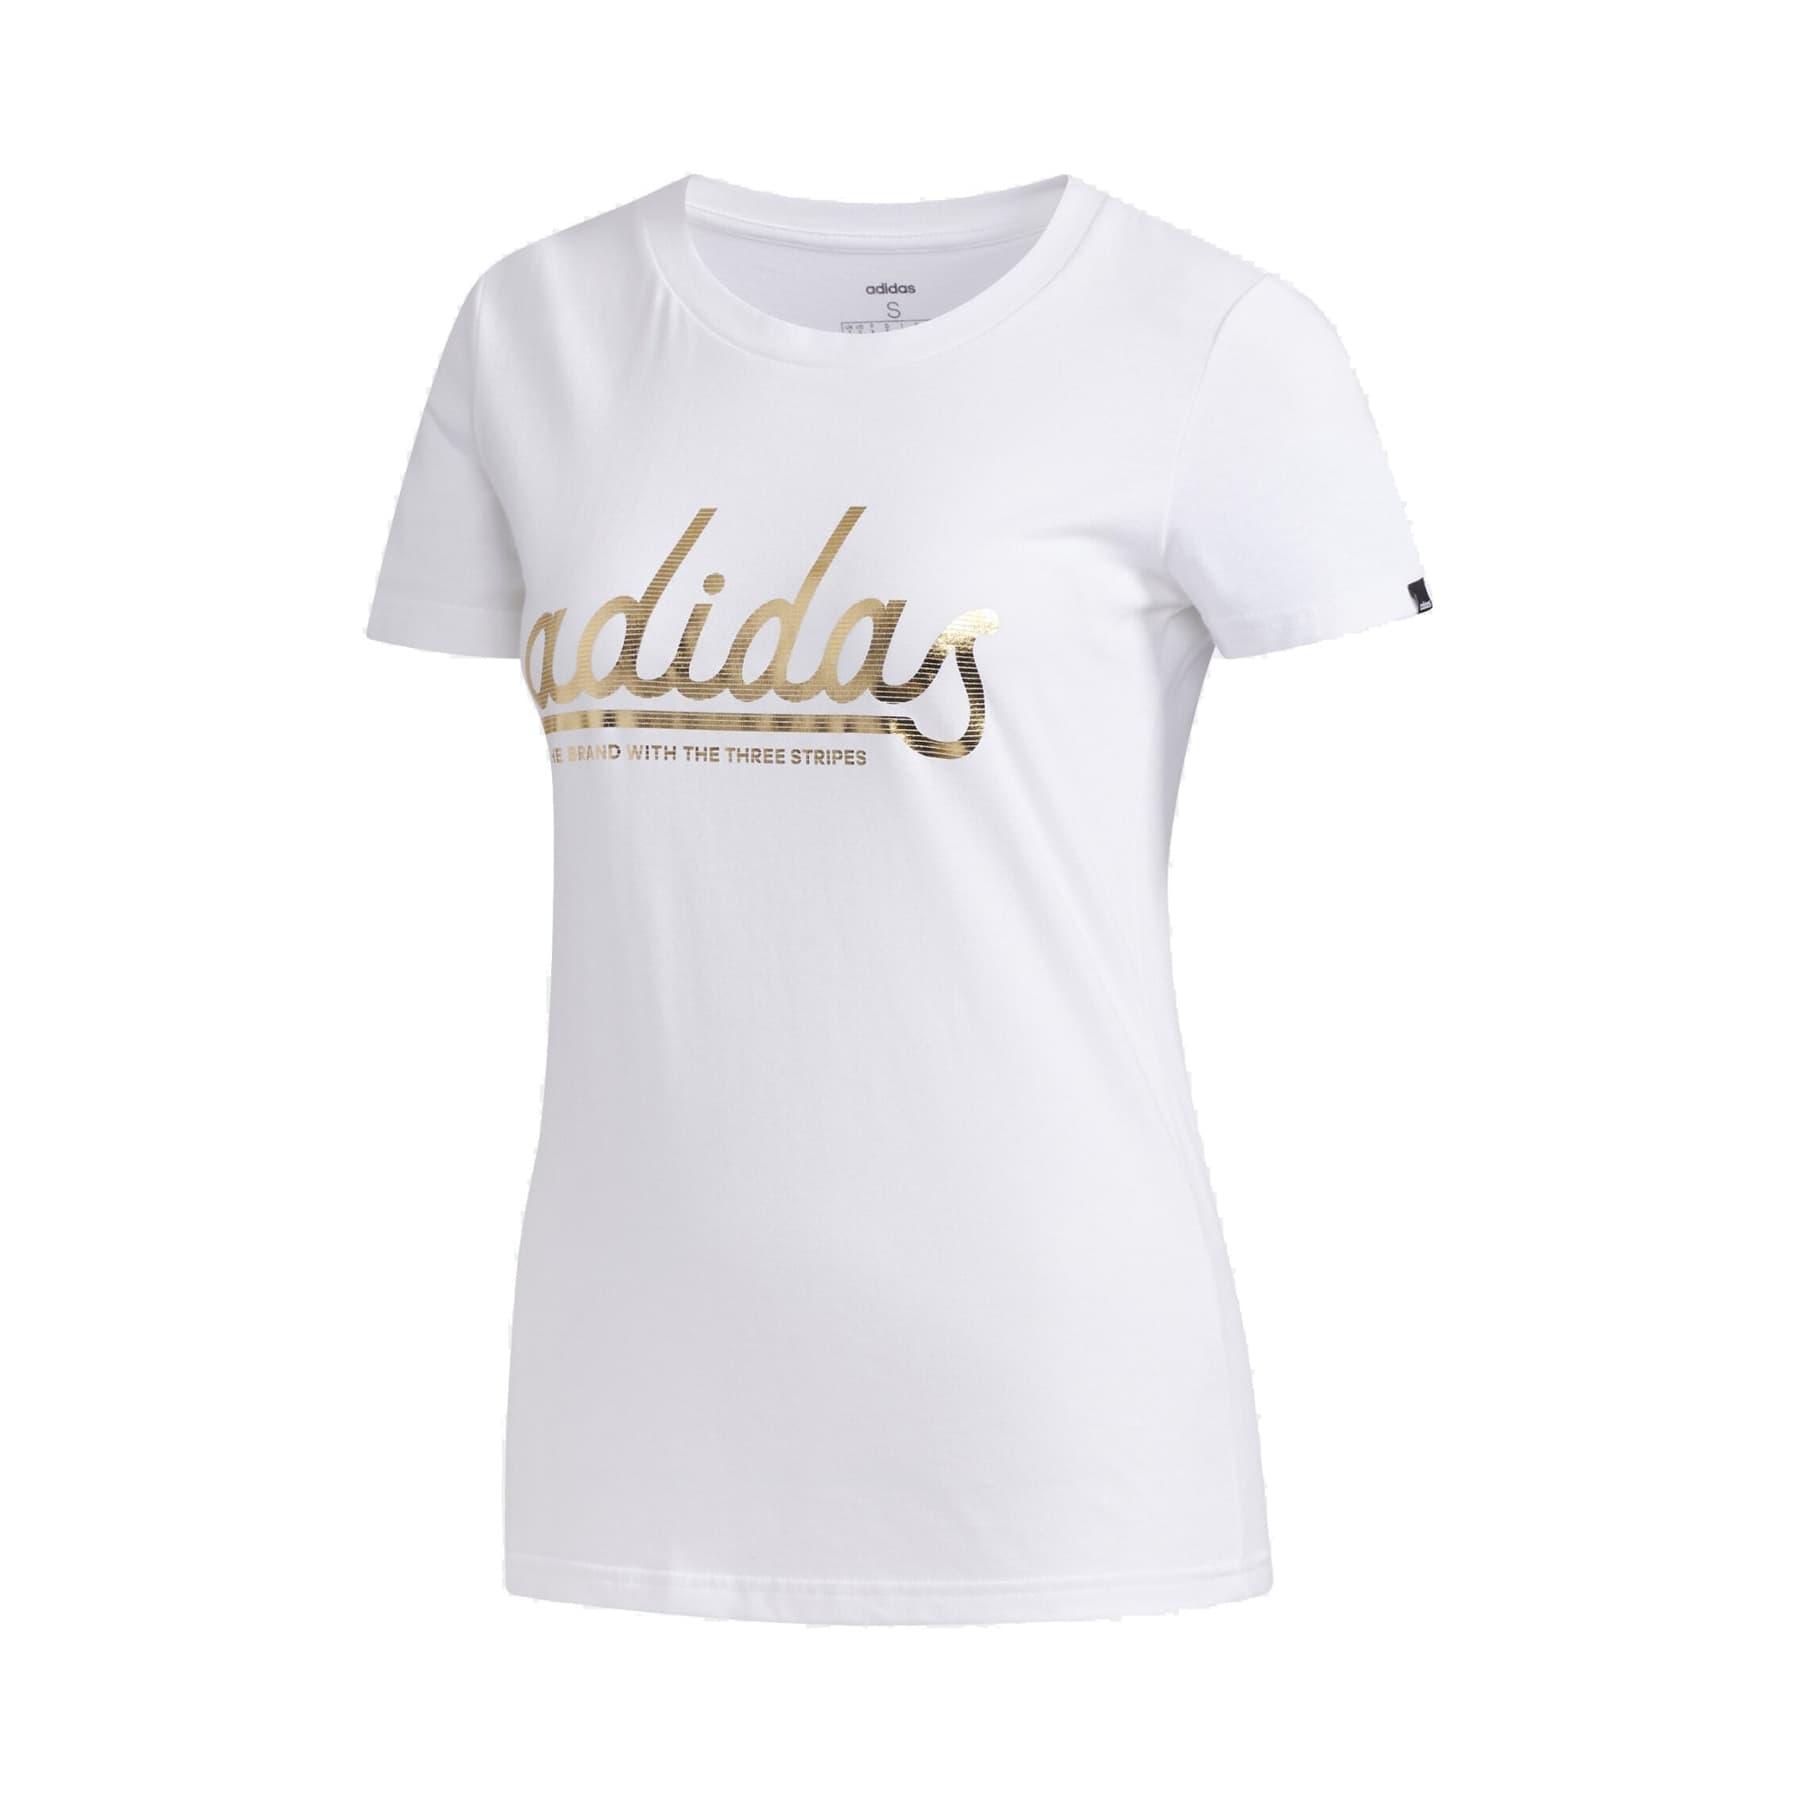 adidas Colgt Foil Kadın Beyaz Tişört (FM6174)